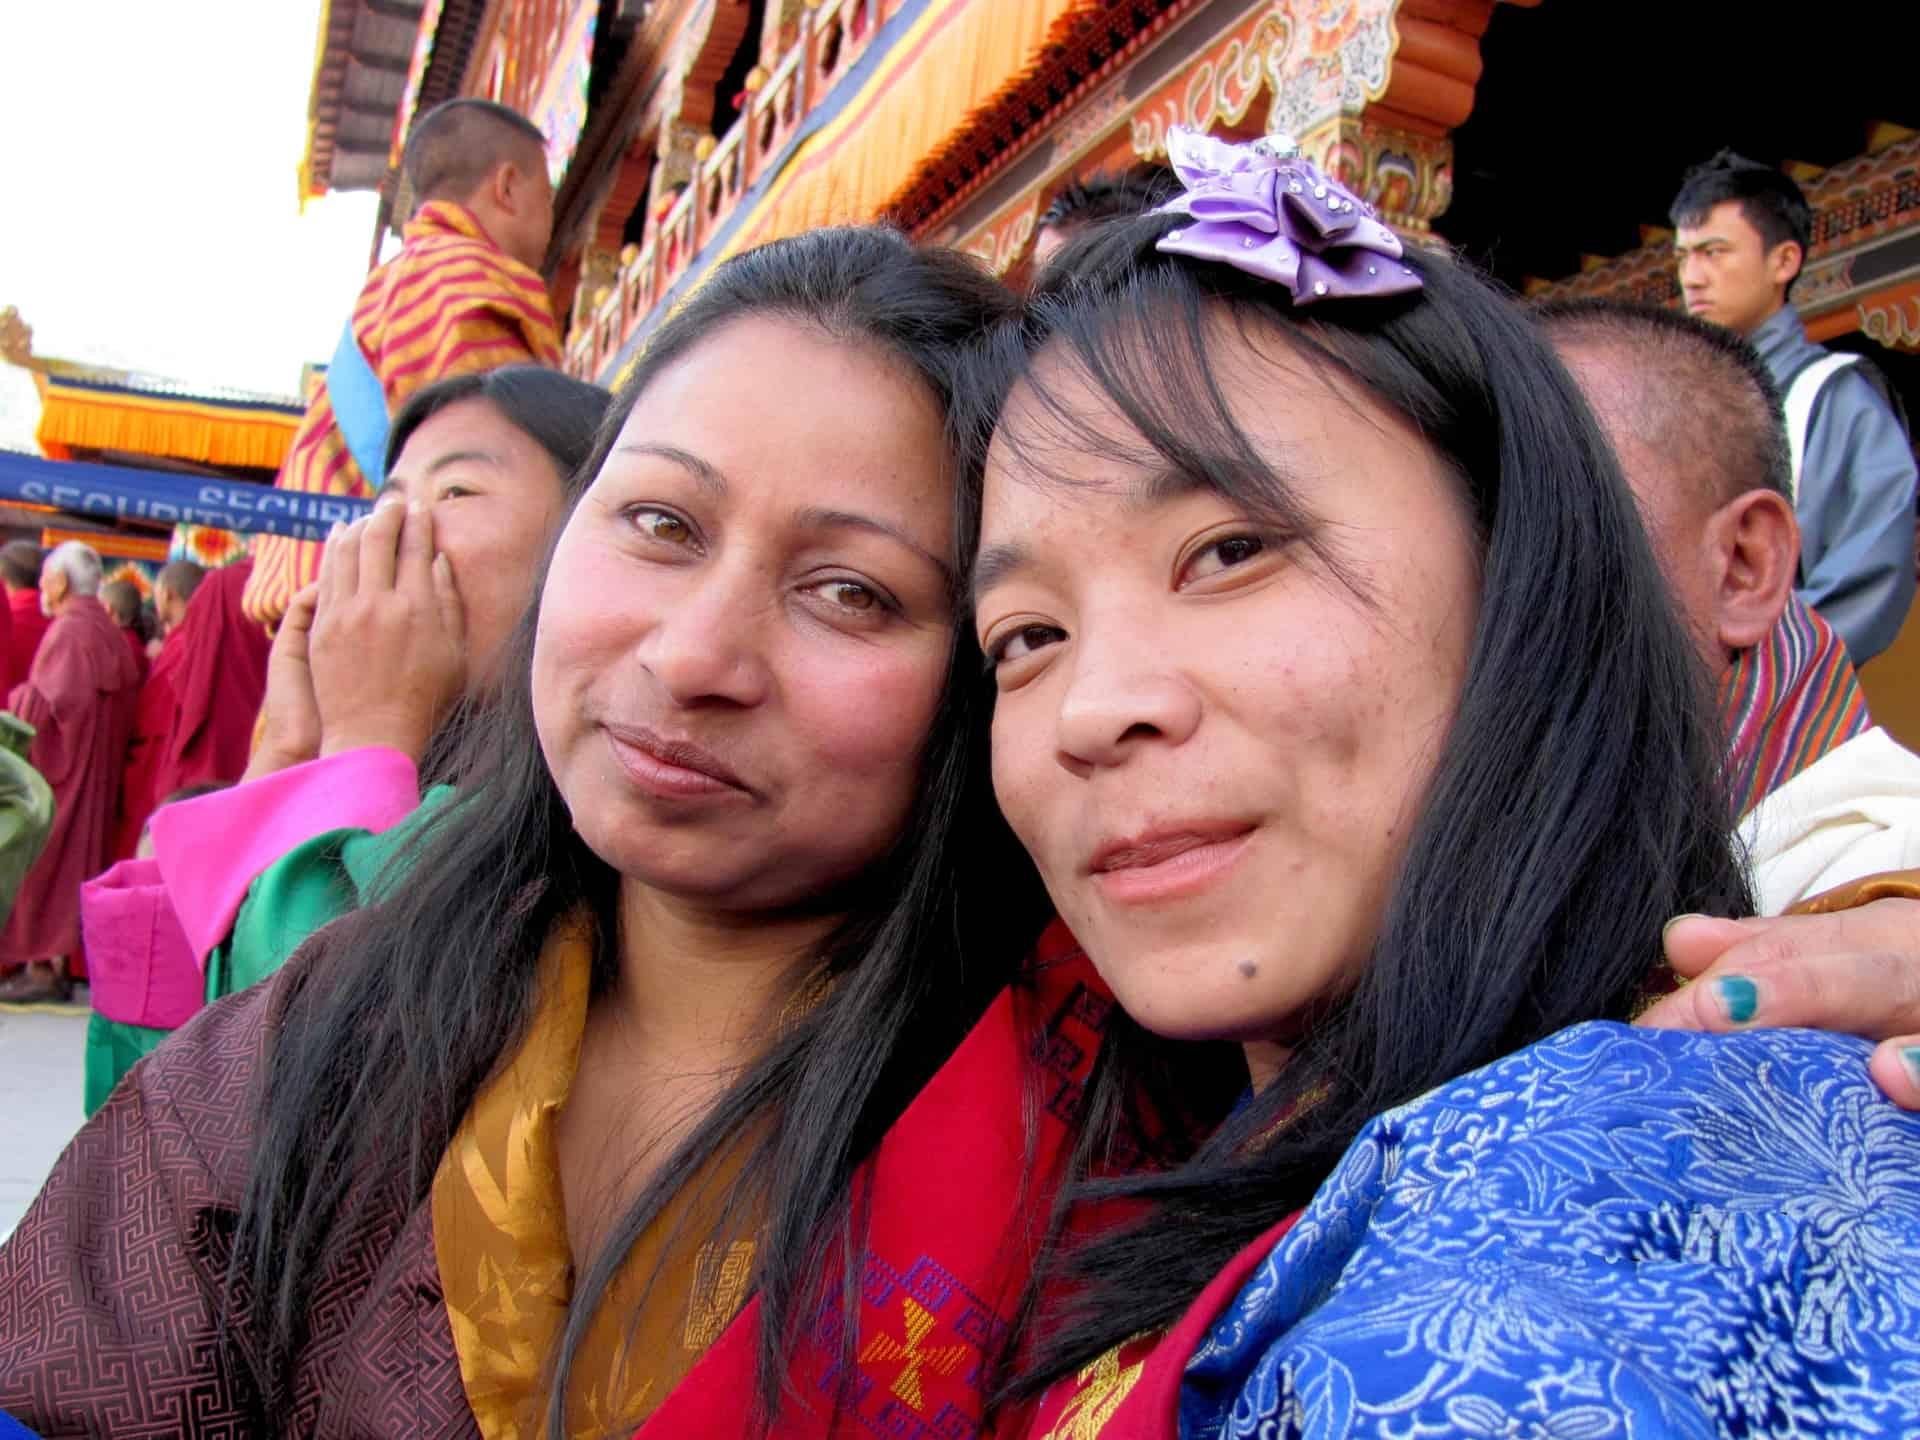 Glade bhutanesere